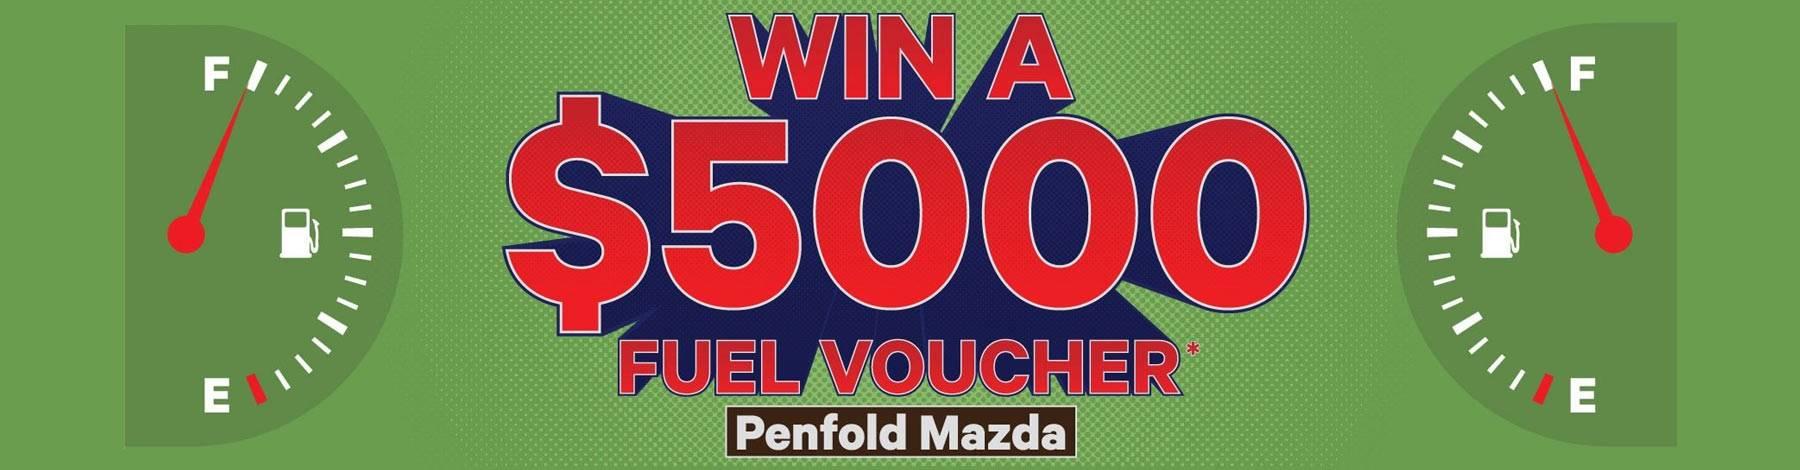 Penfold Mazda Win A Fuel Voucher